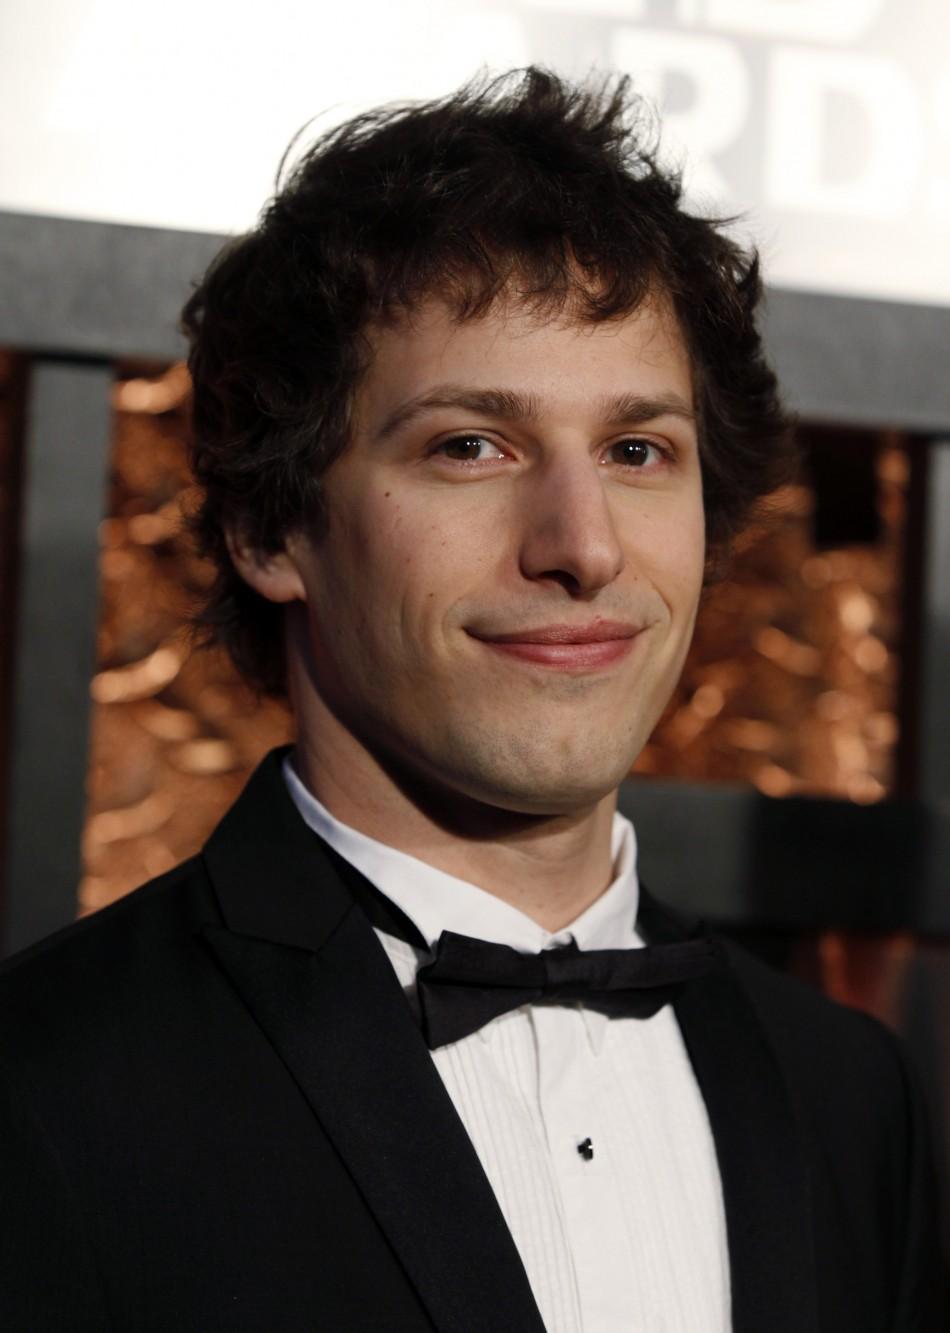 Andy Samberg Emmy Awards 2015